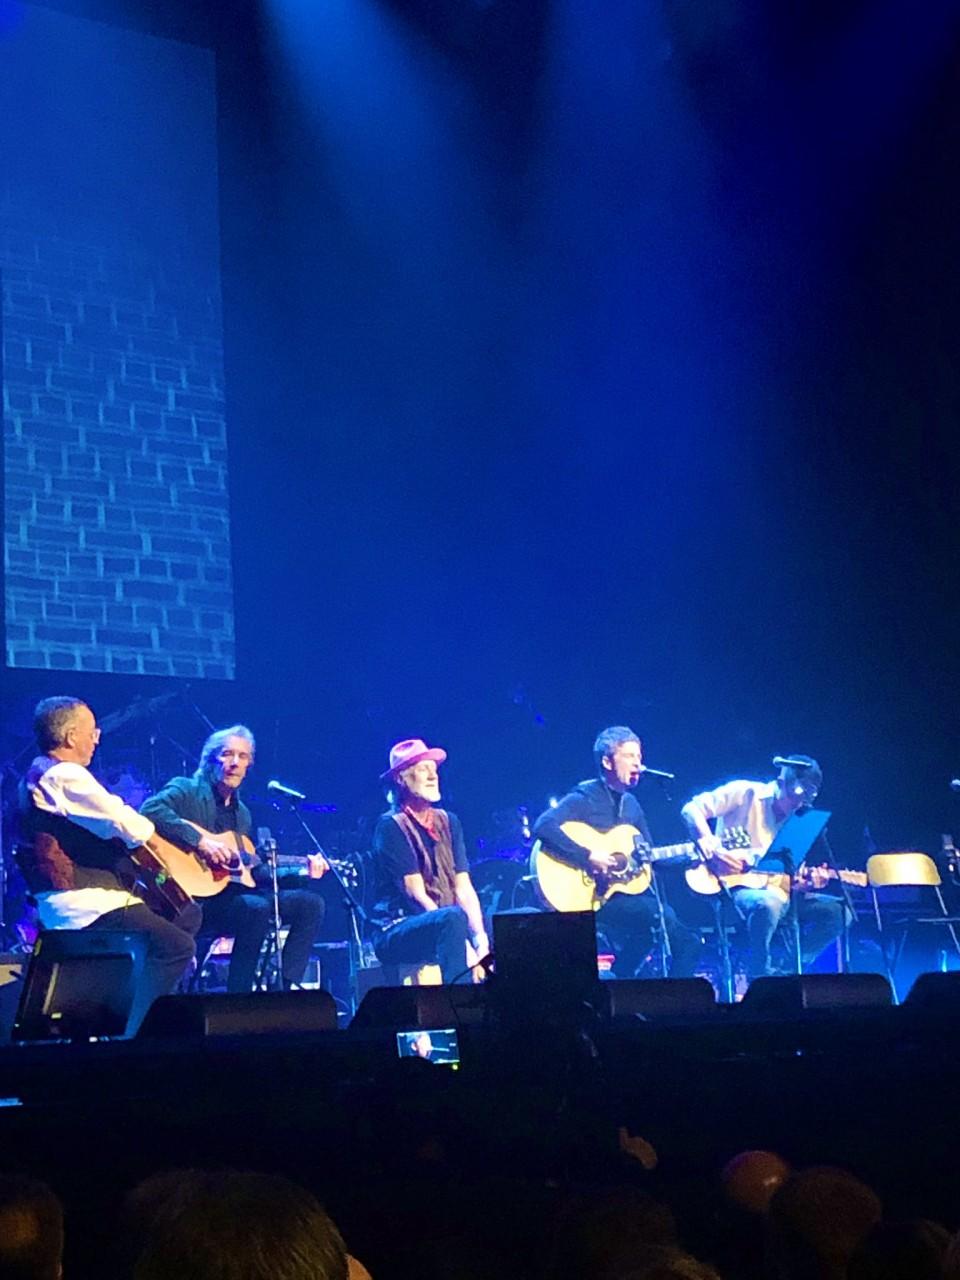 Video - Noel in acustico al Peter Green Tribute 'The World Keeps Turning'